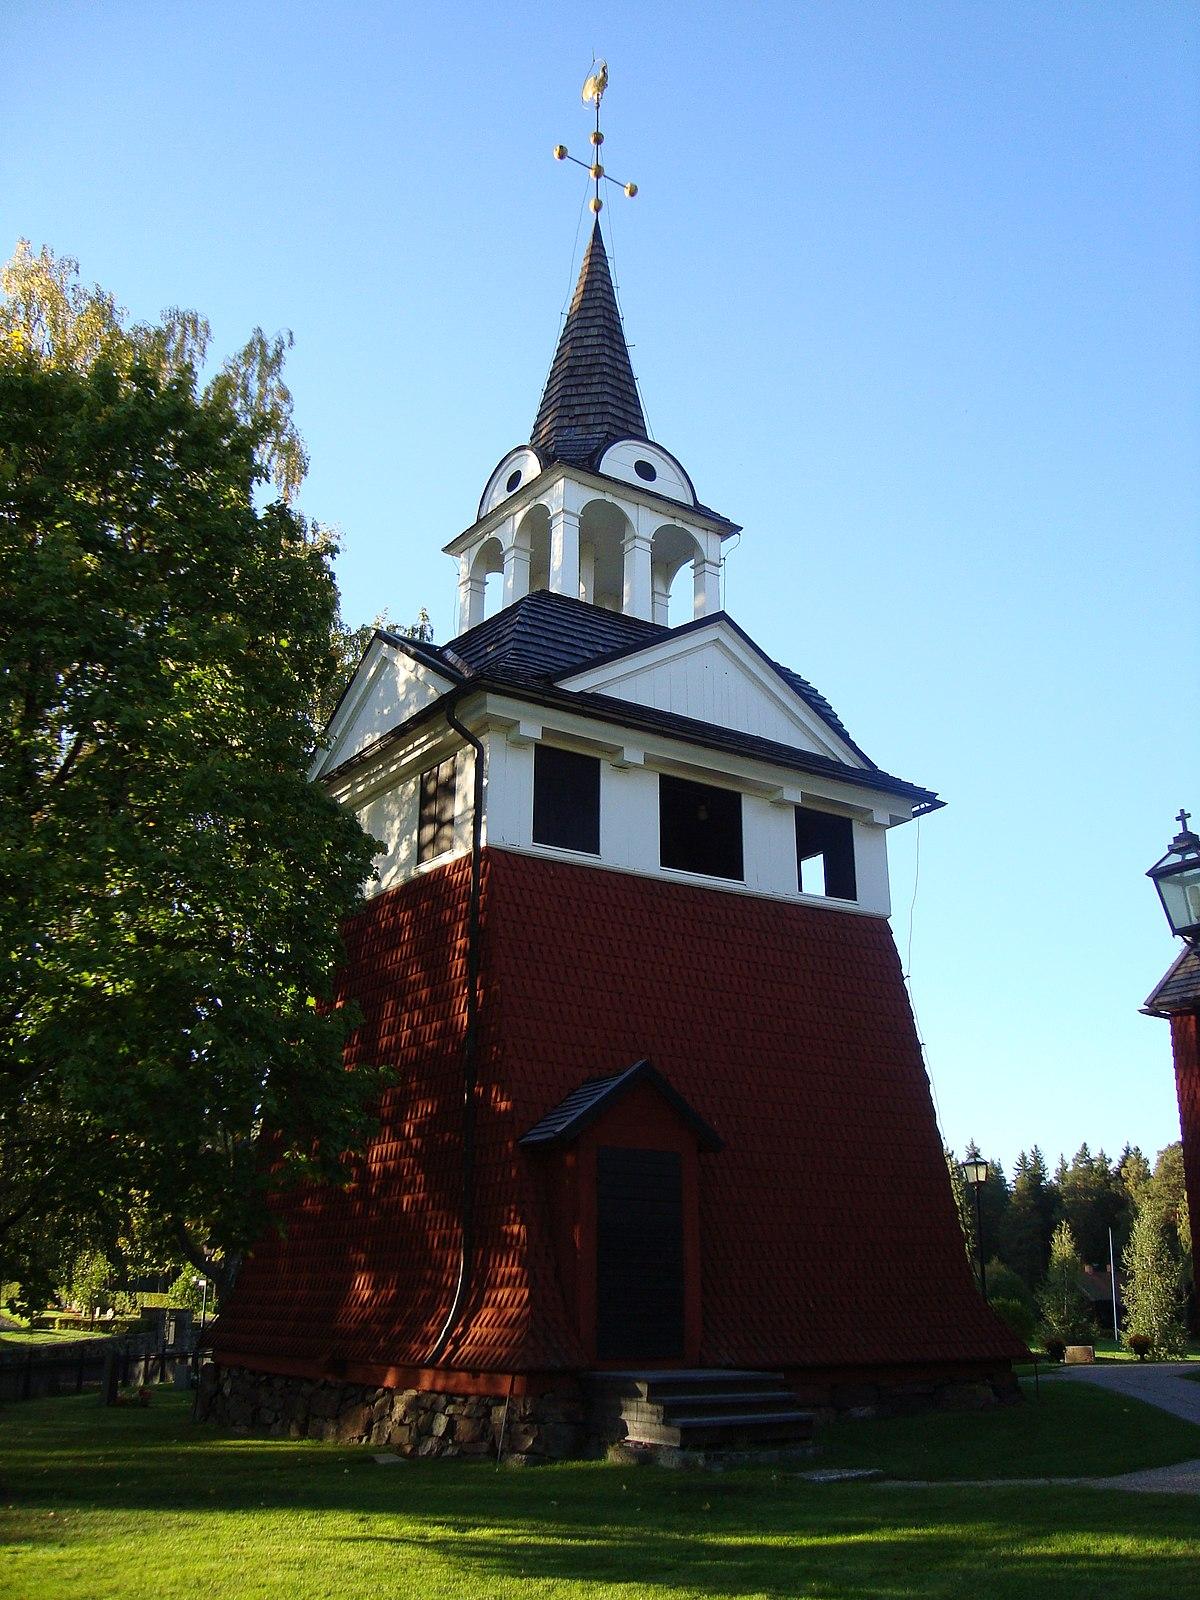 Carl Larsson-gården in Sundborn   World Heritage Journeys of Europe